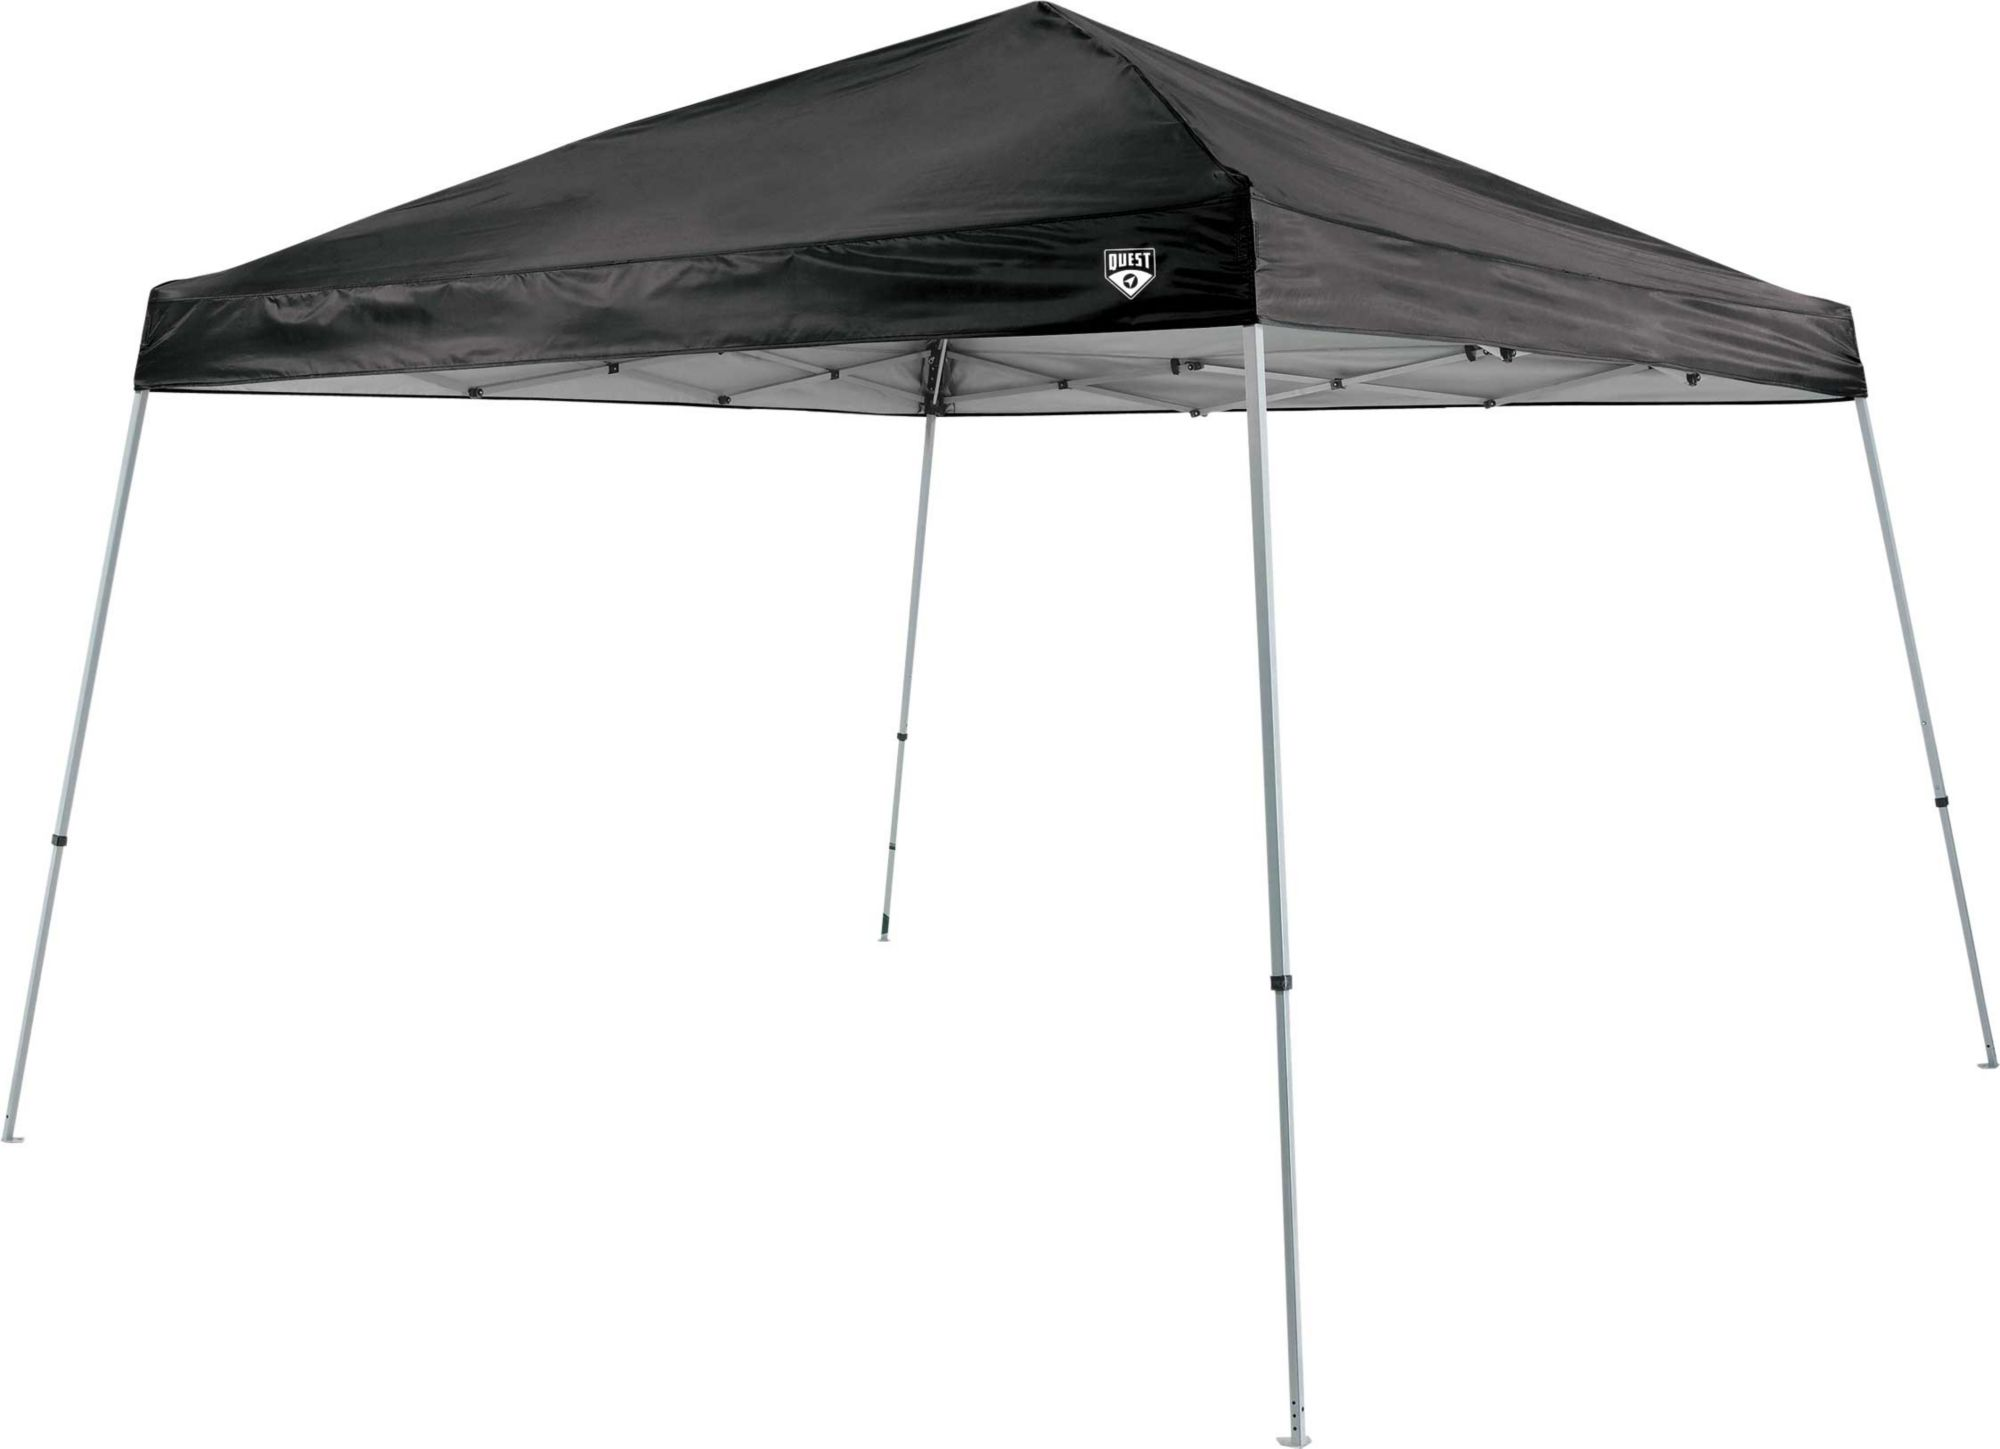 Slant Leg Instant Up Canopy